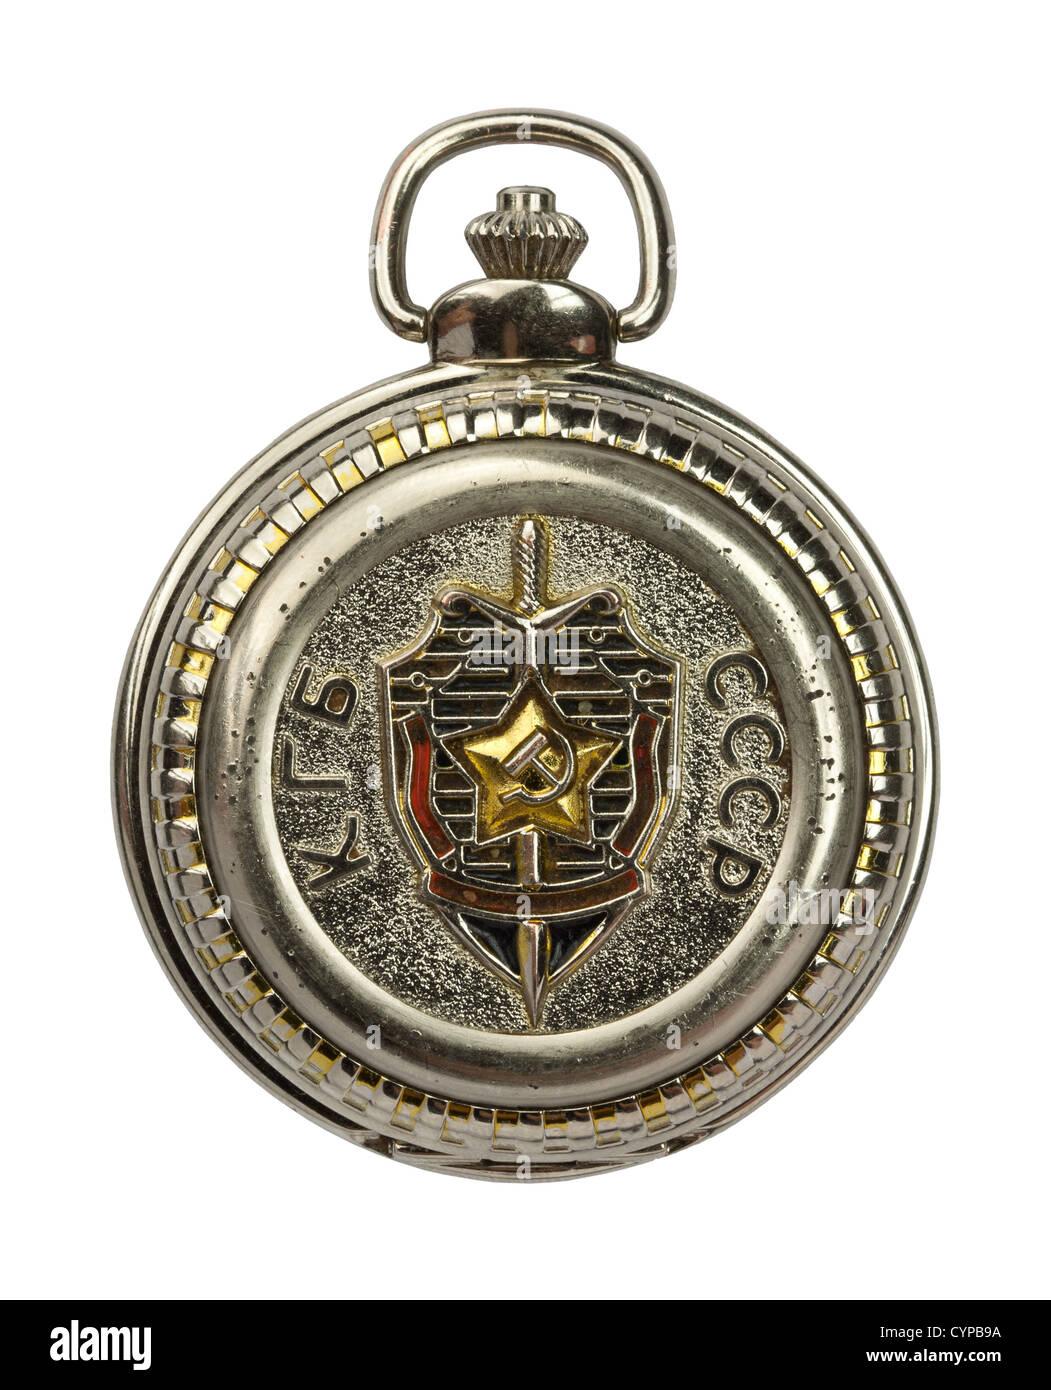 Russian USSR KGB secret police old pocket watch, clock - Stock Image